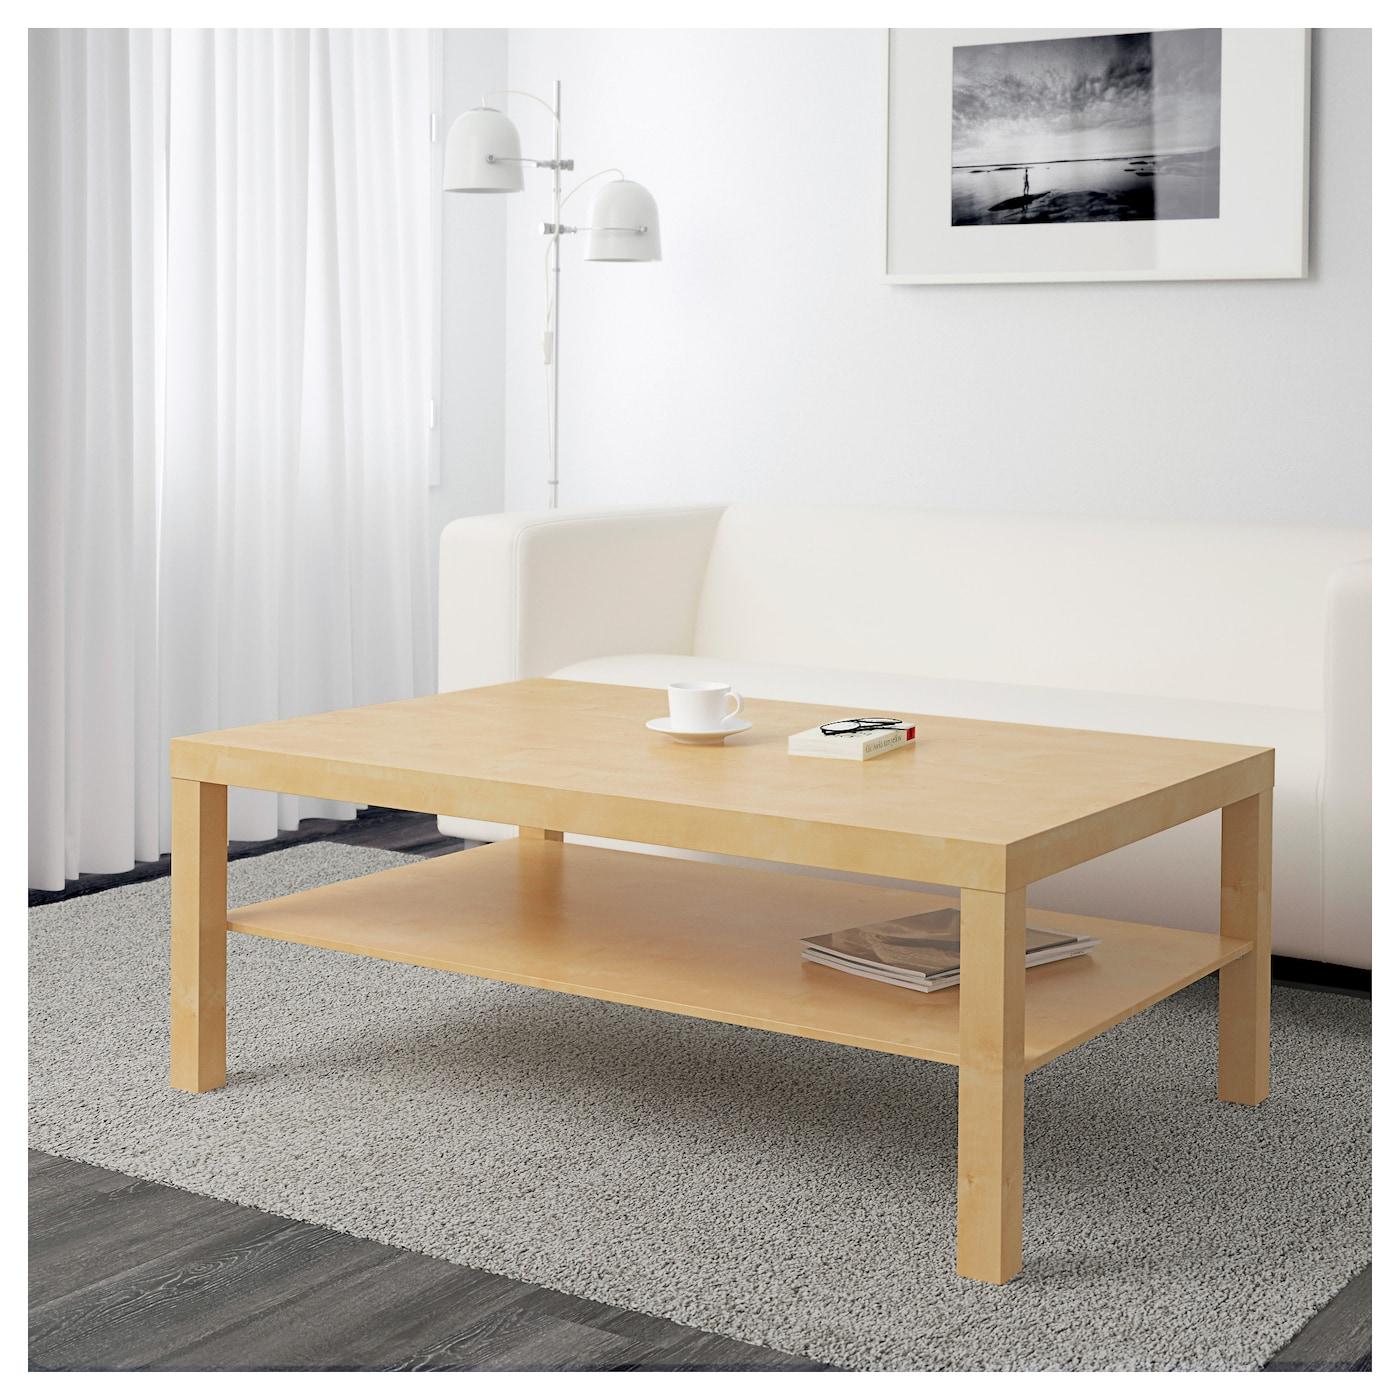 Ikea Metal Coffee Table Wheels: LACK Coffee Table Birch Effect 118 X 78 Cm